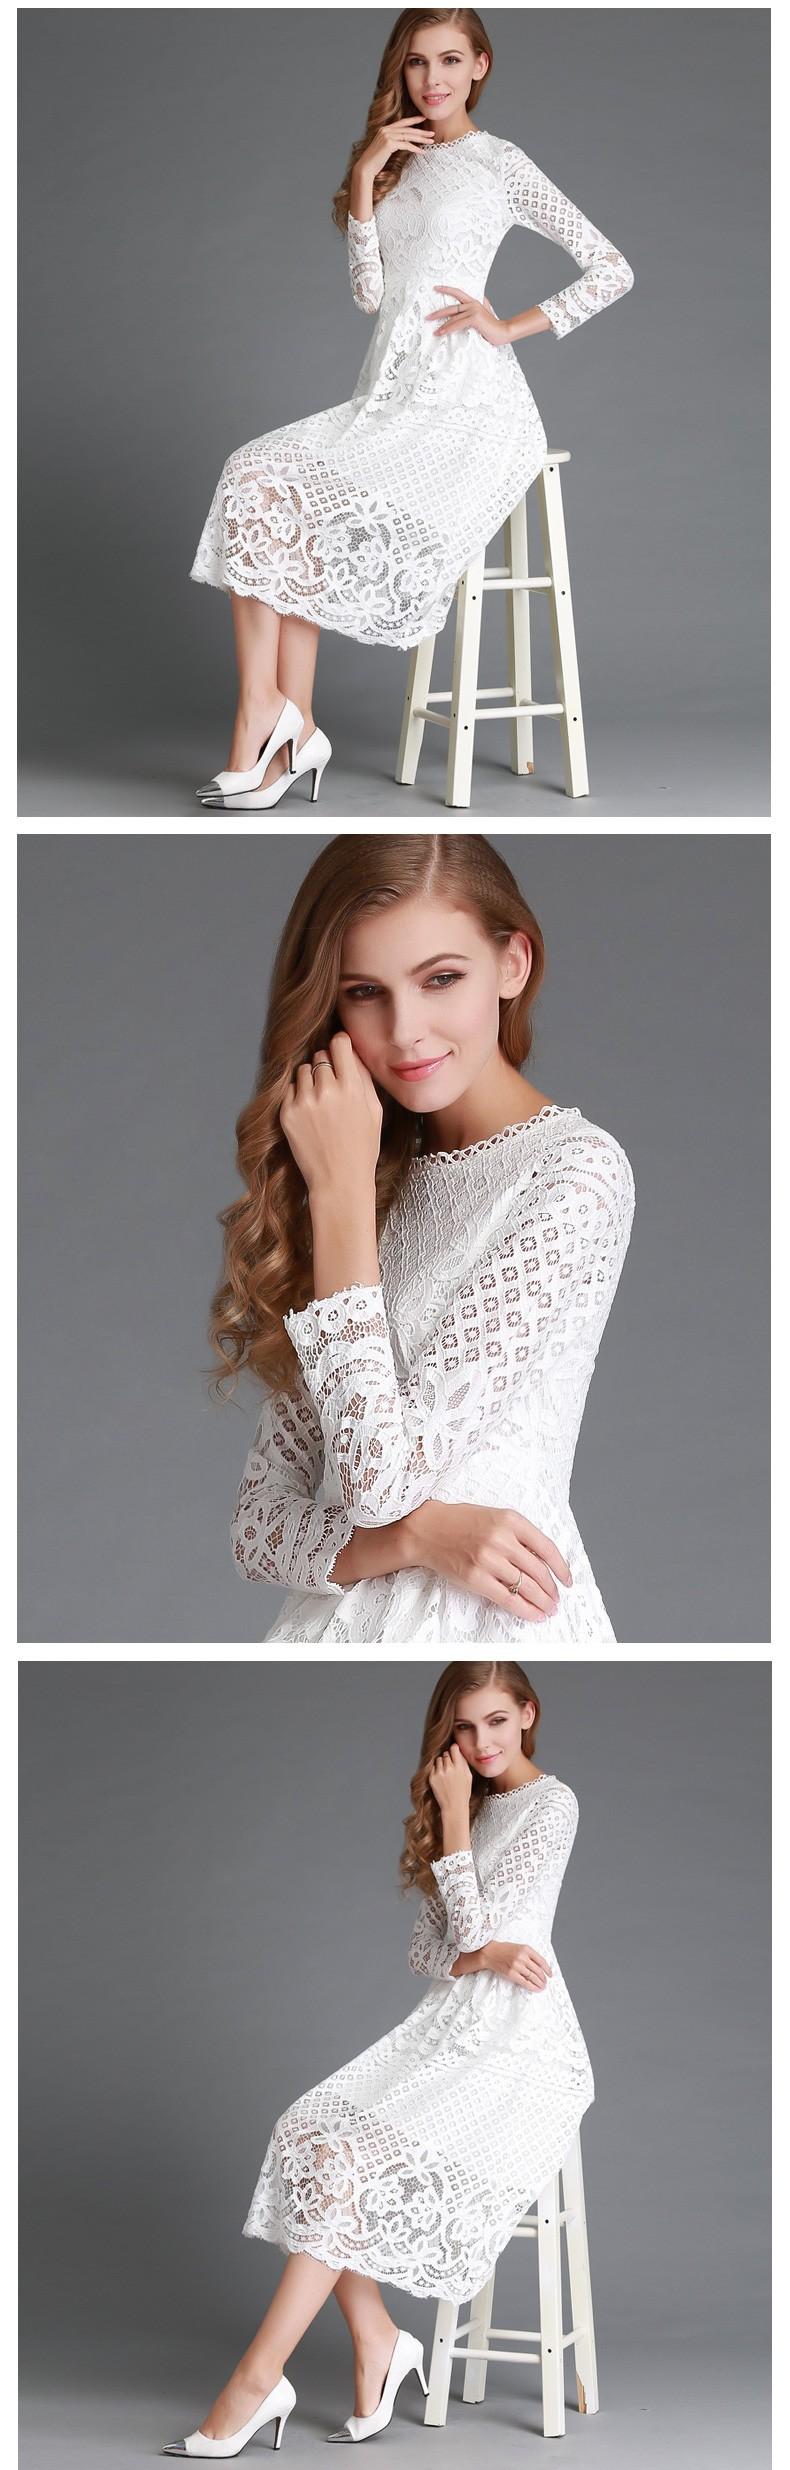 Beauty Long Sleeved Lace Dress 2